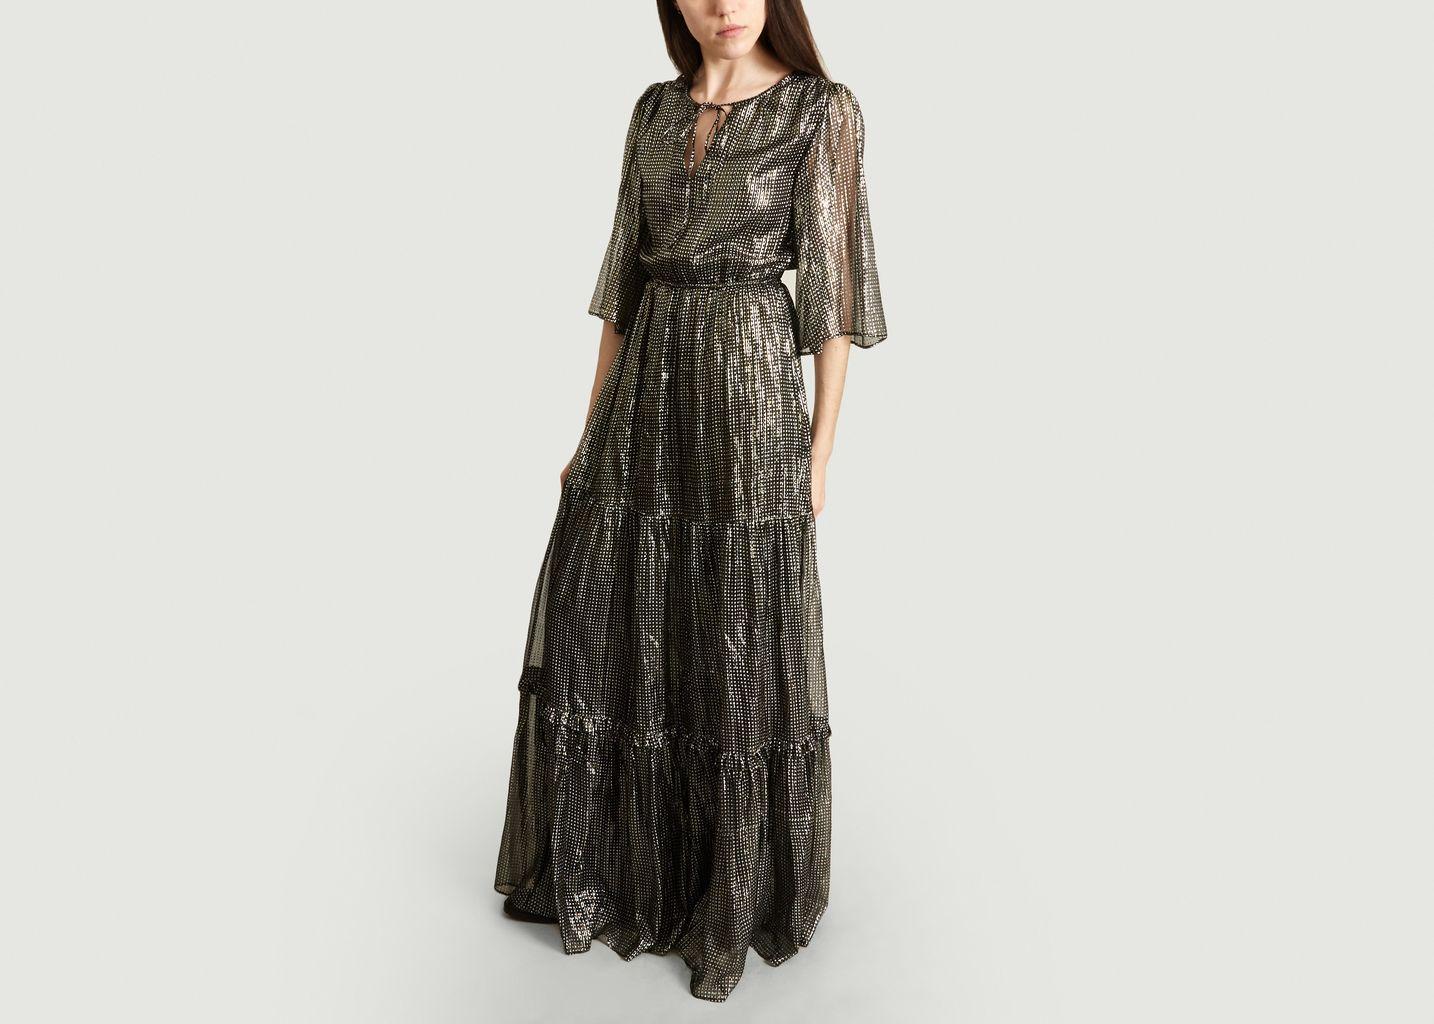 Robe Longue - Tara Jarmon